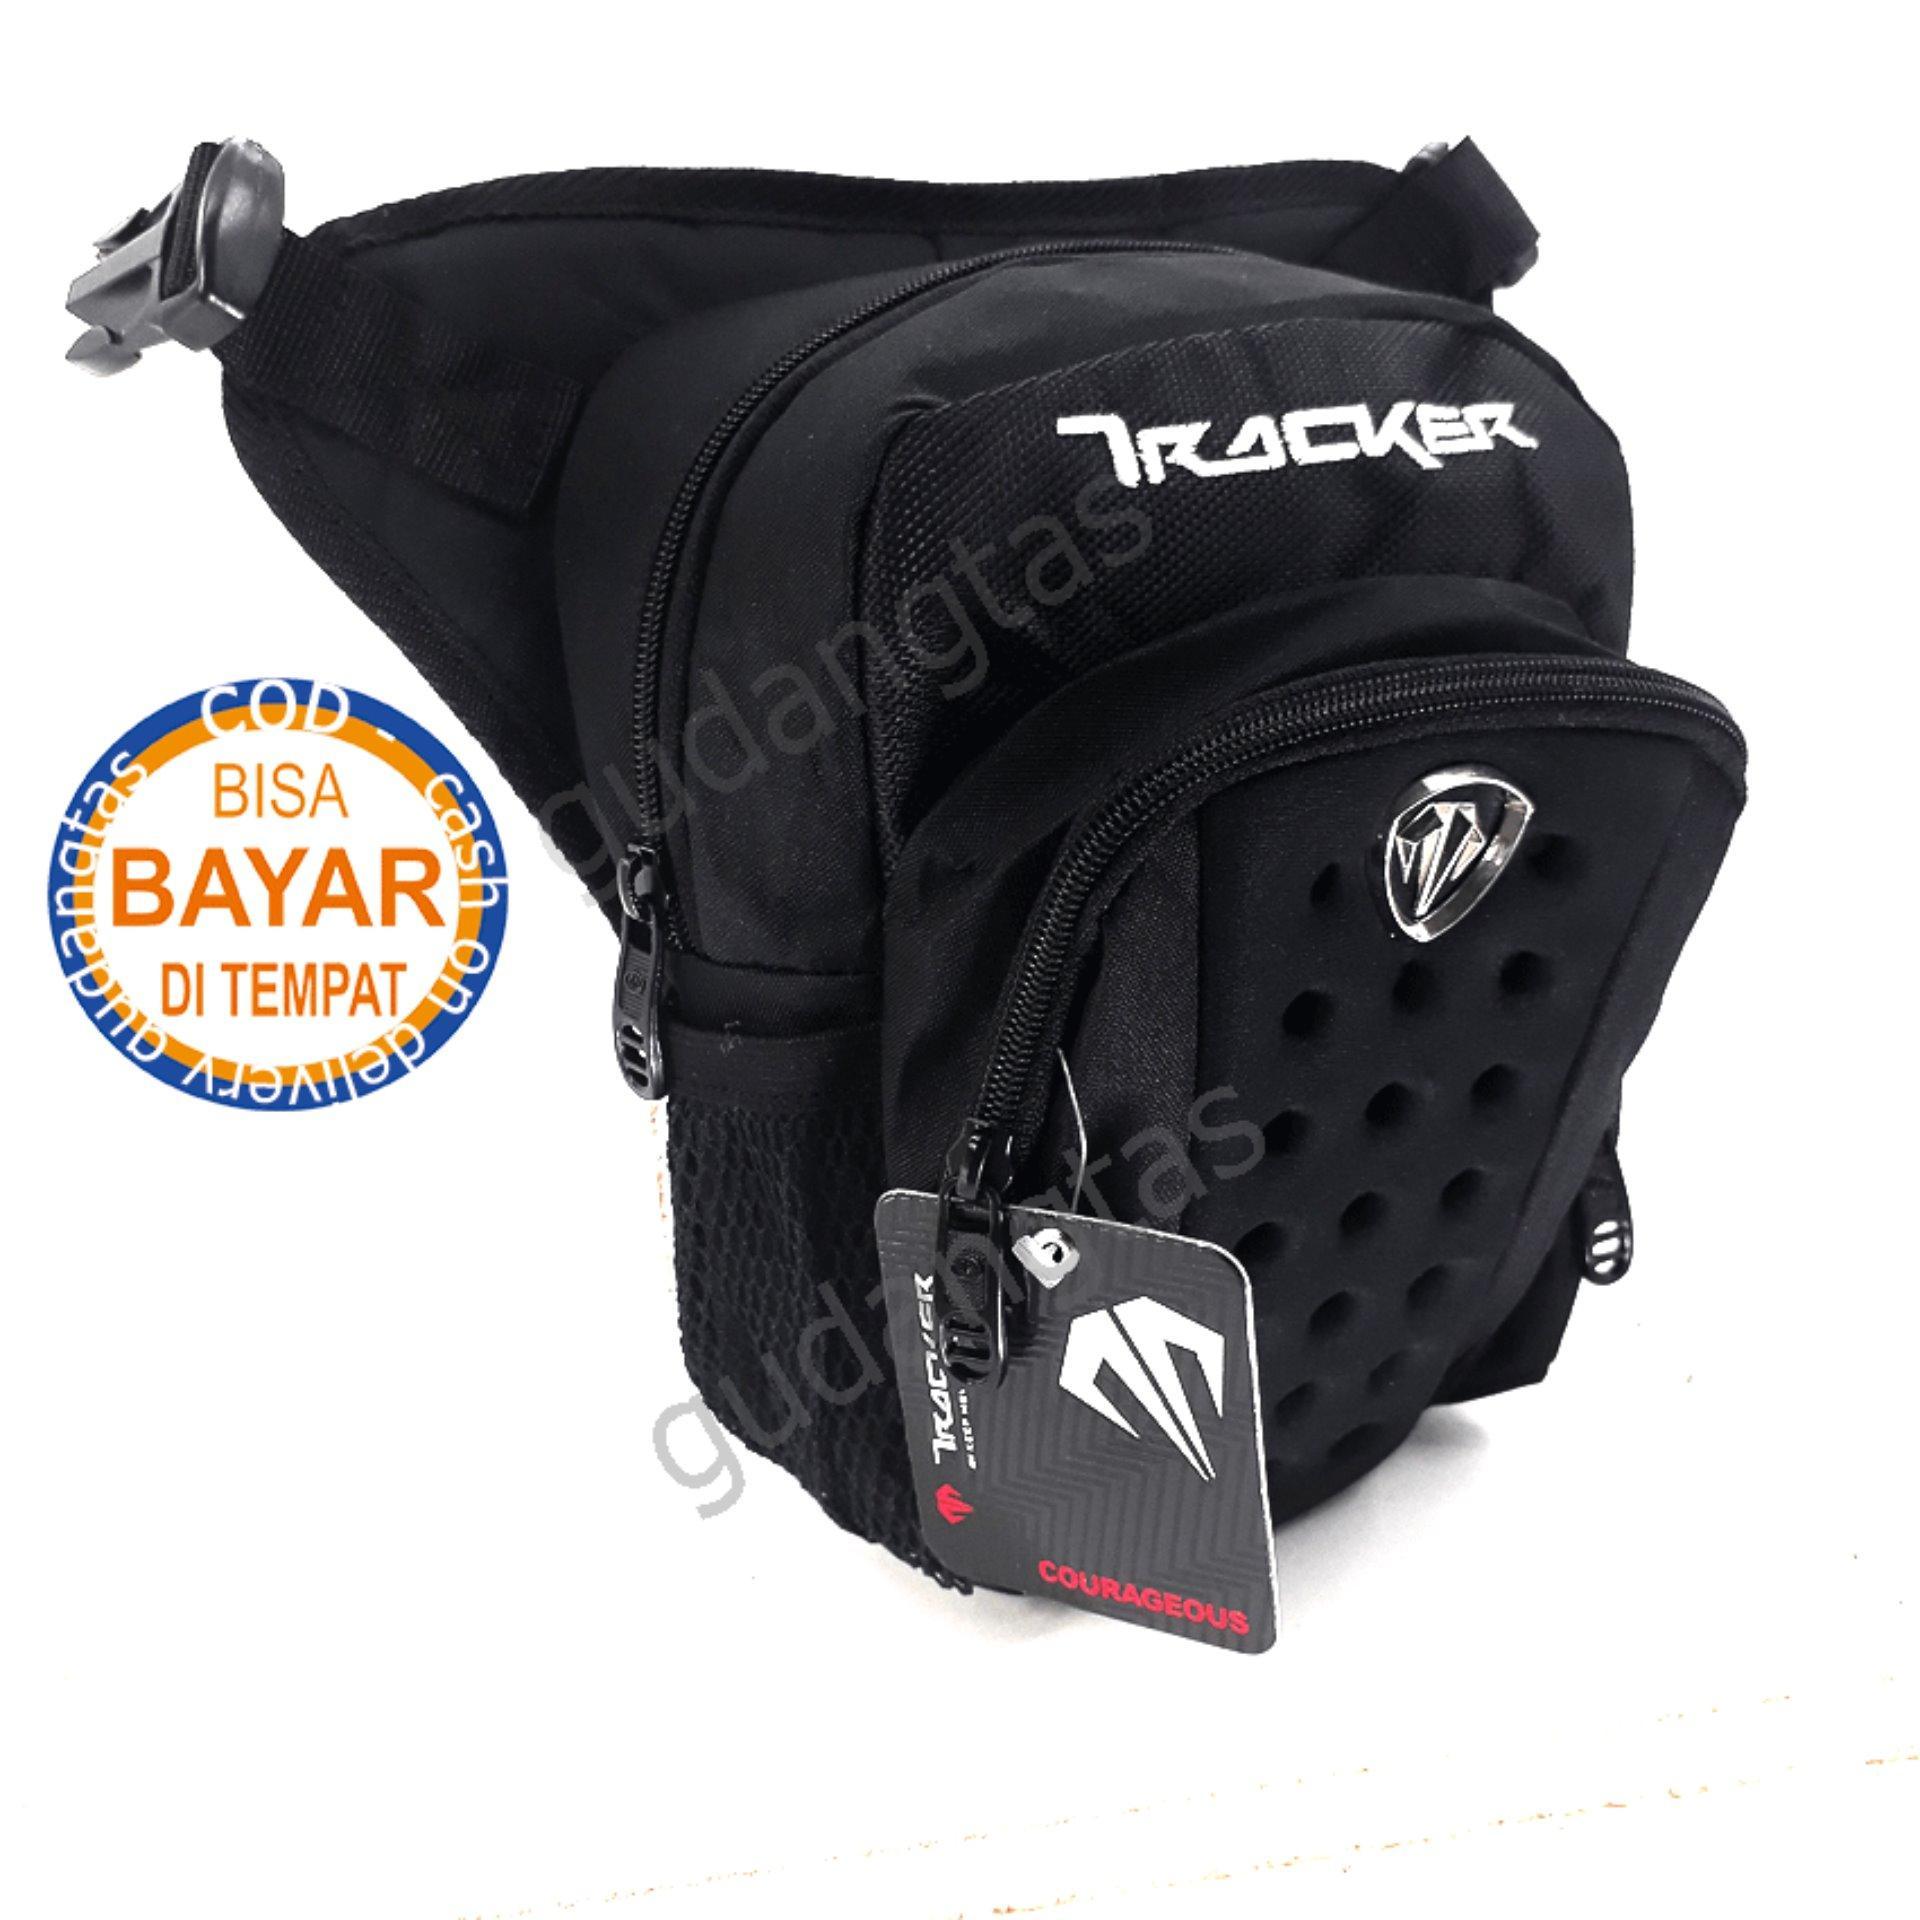 Tas Tracker Tas Paha Pria Tas Pinggang Tas Selempang 4215 3in1 D300 Nylon Emboss Waterproof  – Black